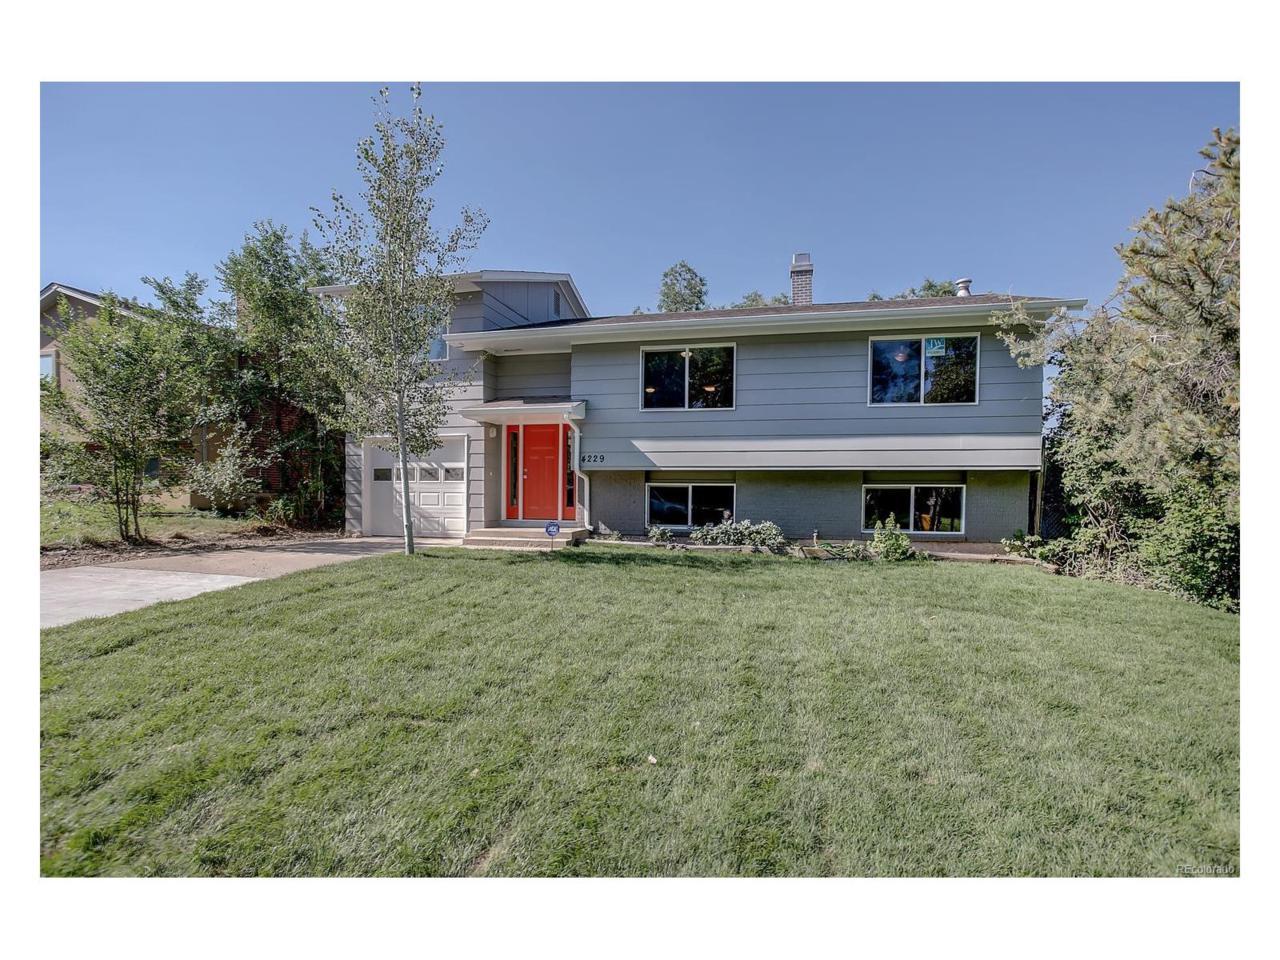 4229 Whittier Drive, Colorado Springs, CO 80910 (MLS #1958588) :: 8z Real Estate